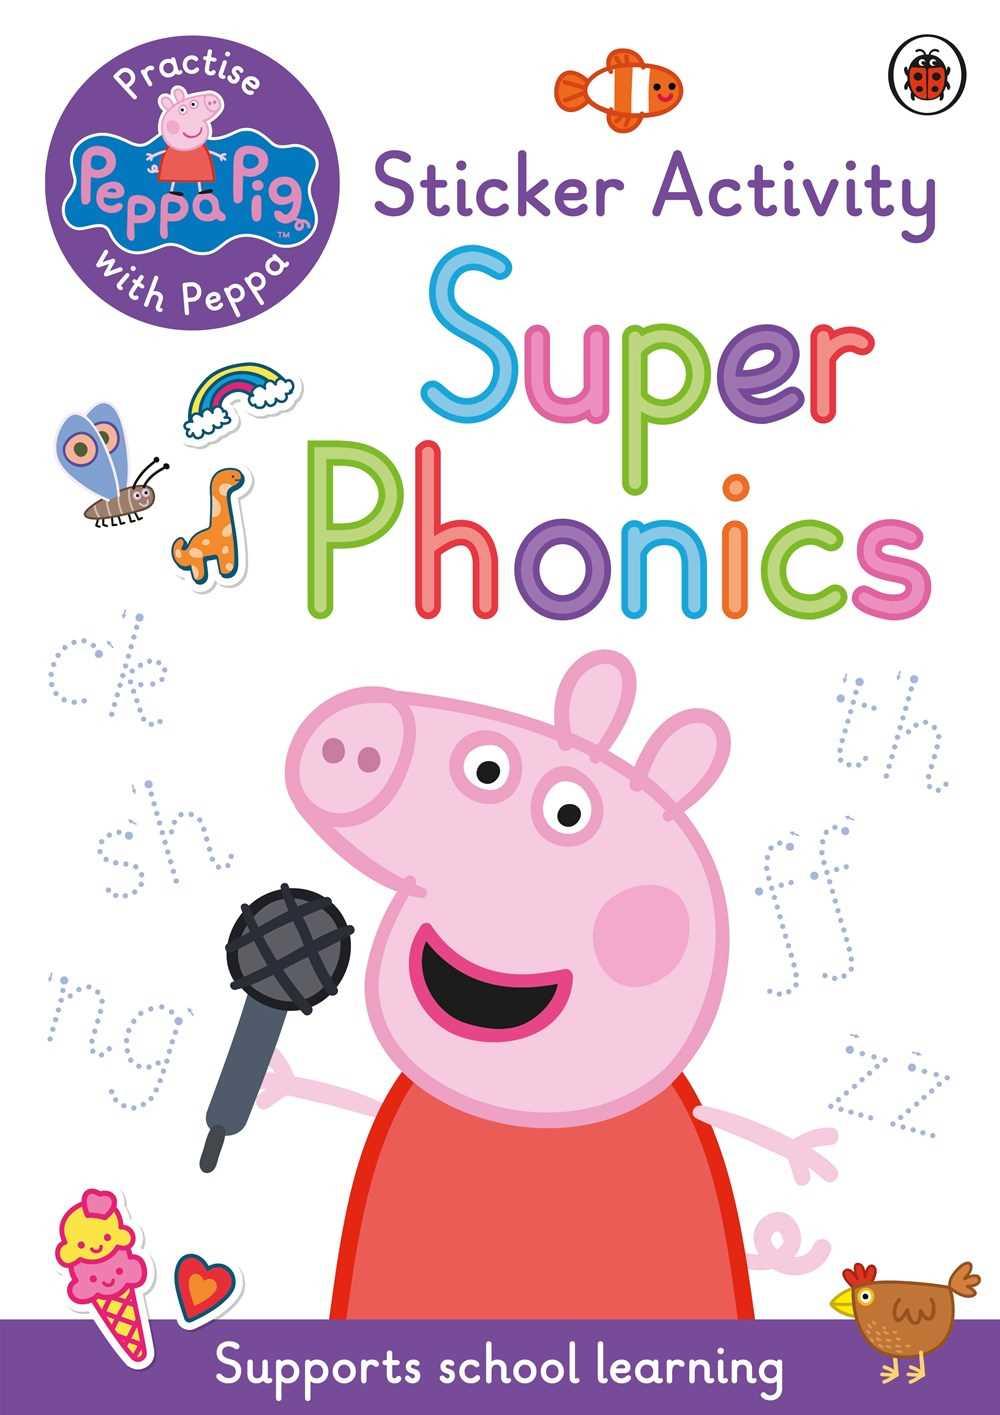 Practise with Peppa: Super Phonics